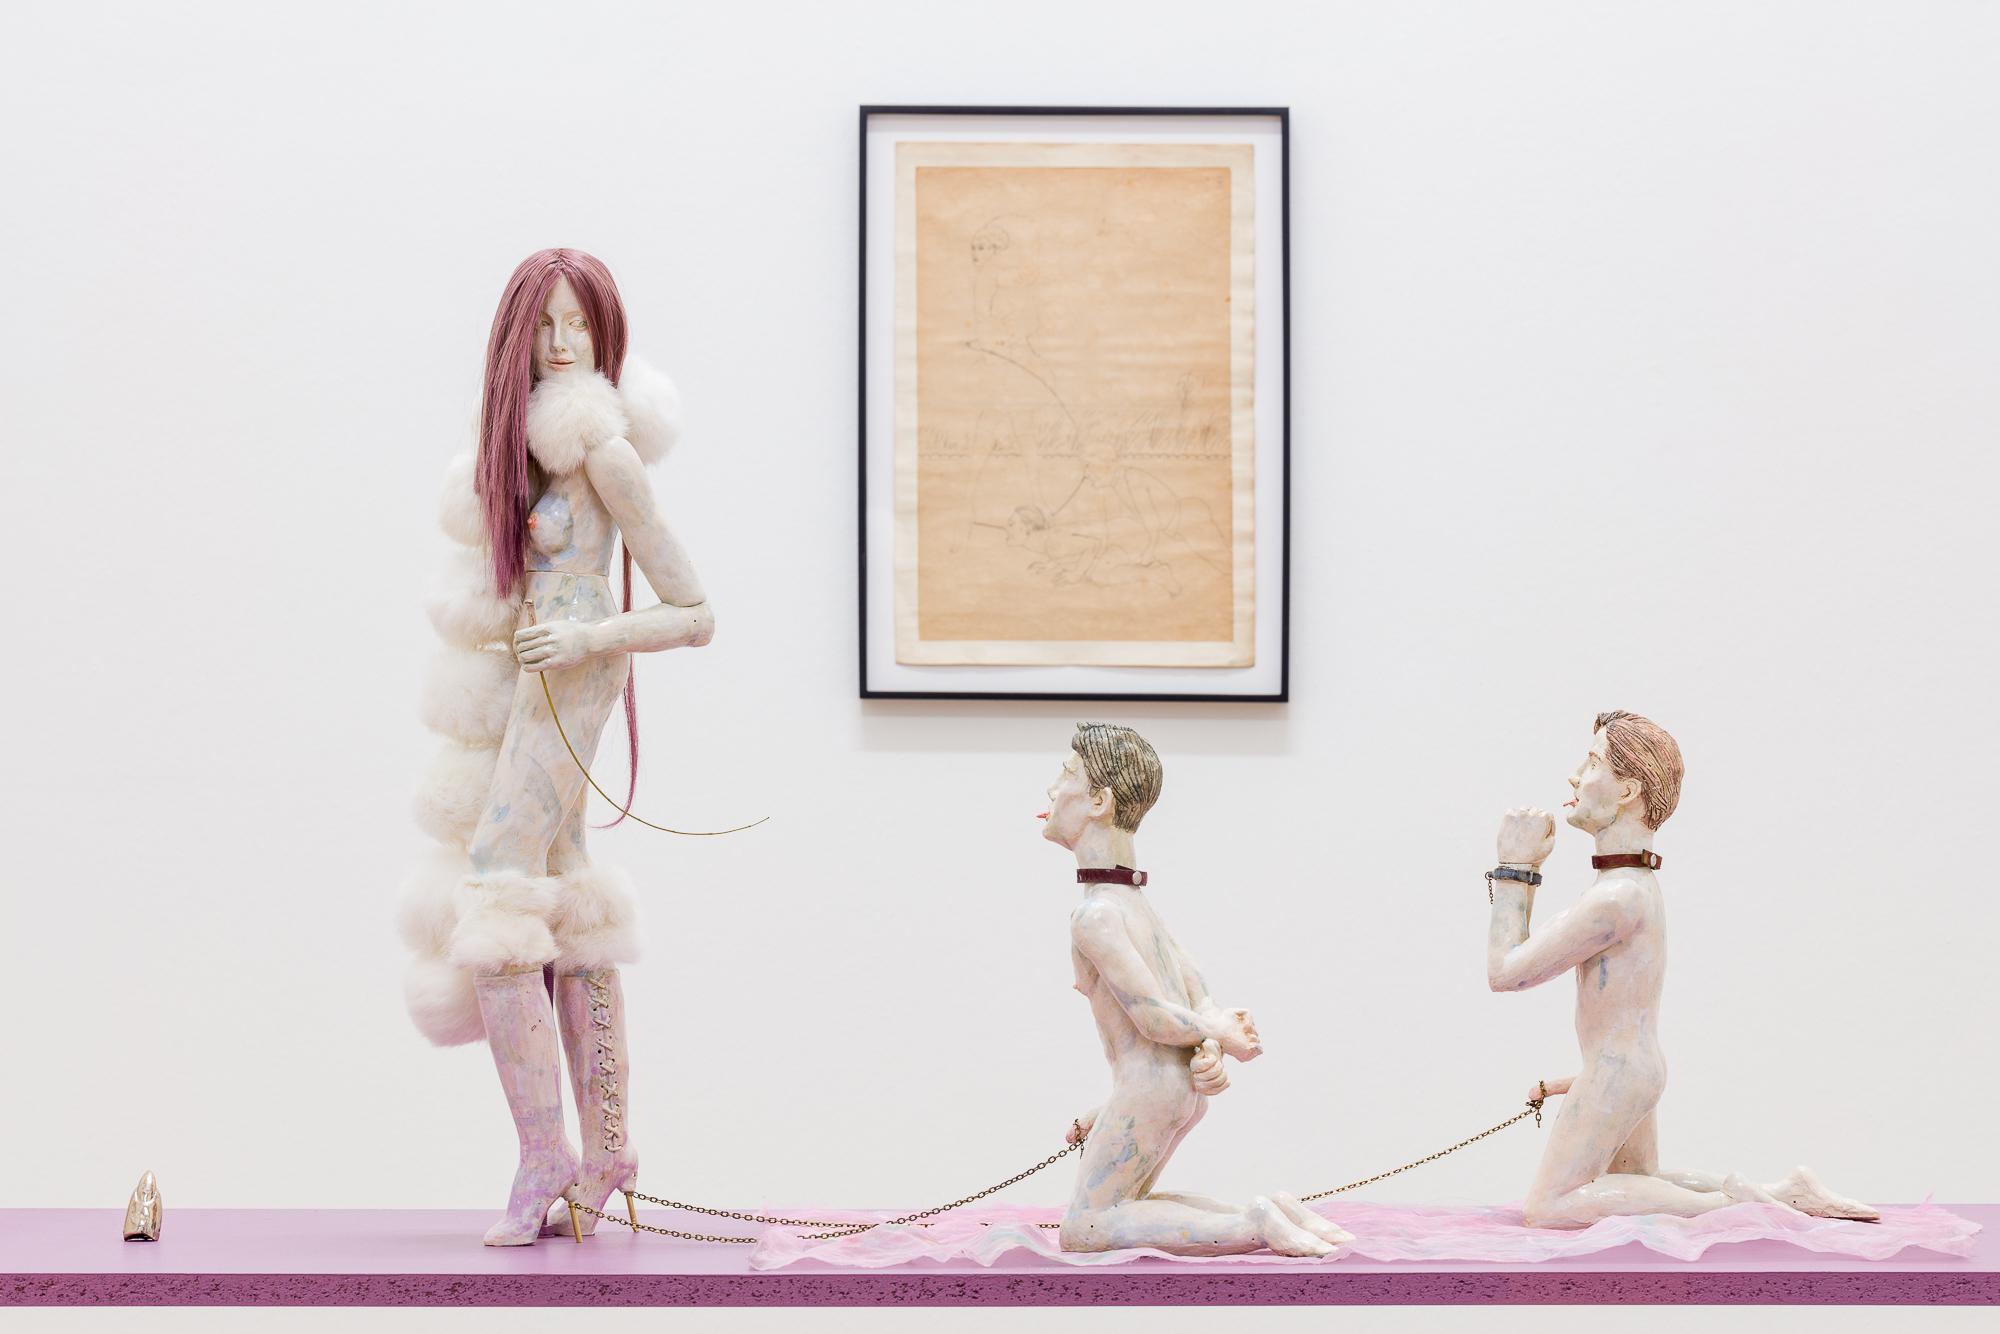 2018_11_22_Zoe Barcza & Soshiro Matsubara at Croy Nielsen by kunstdokumentationcom_003_web.jpg